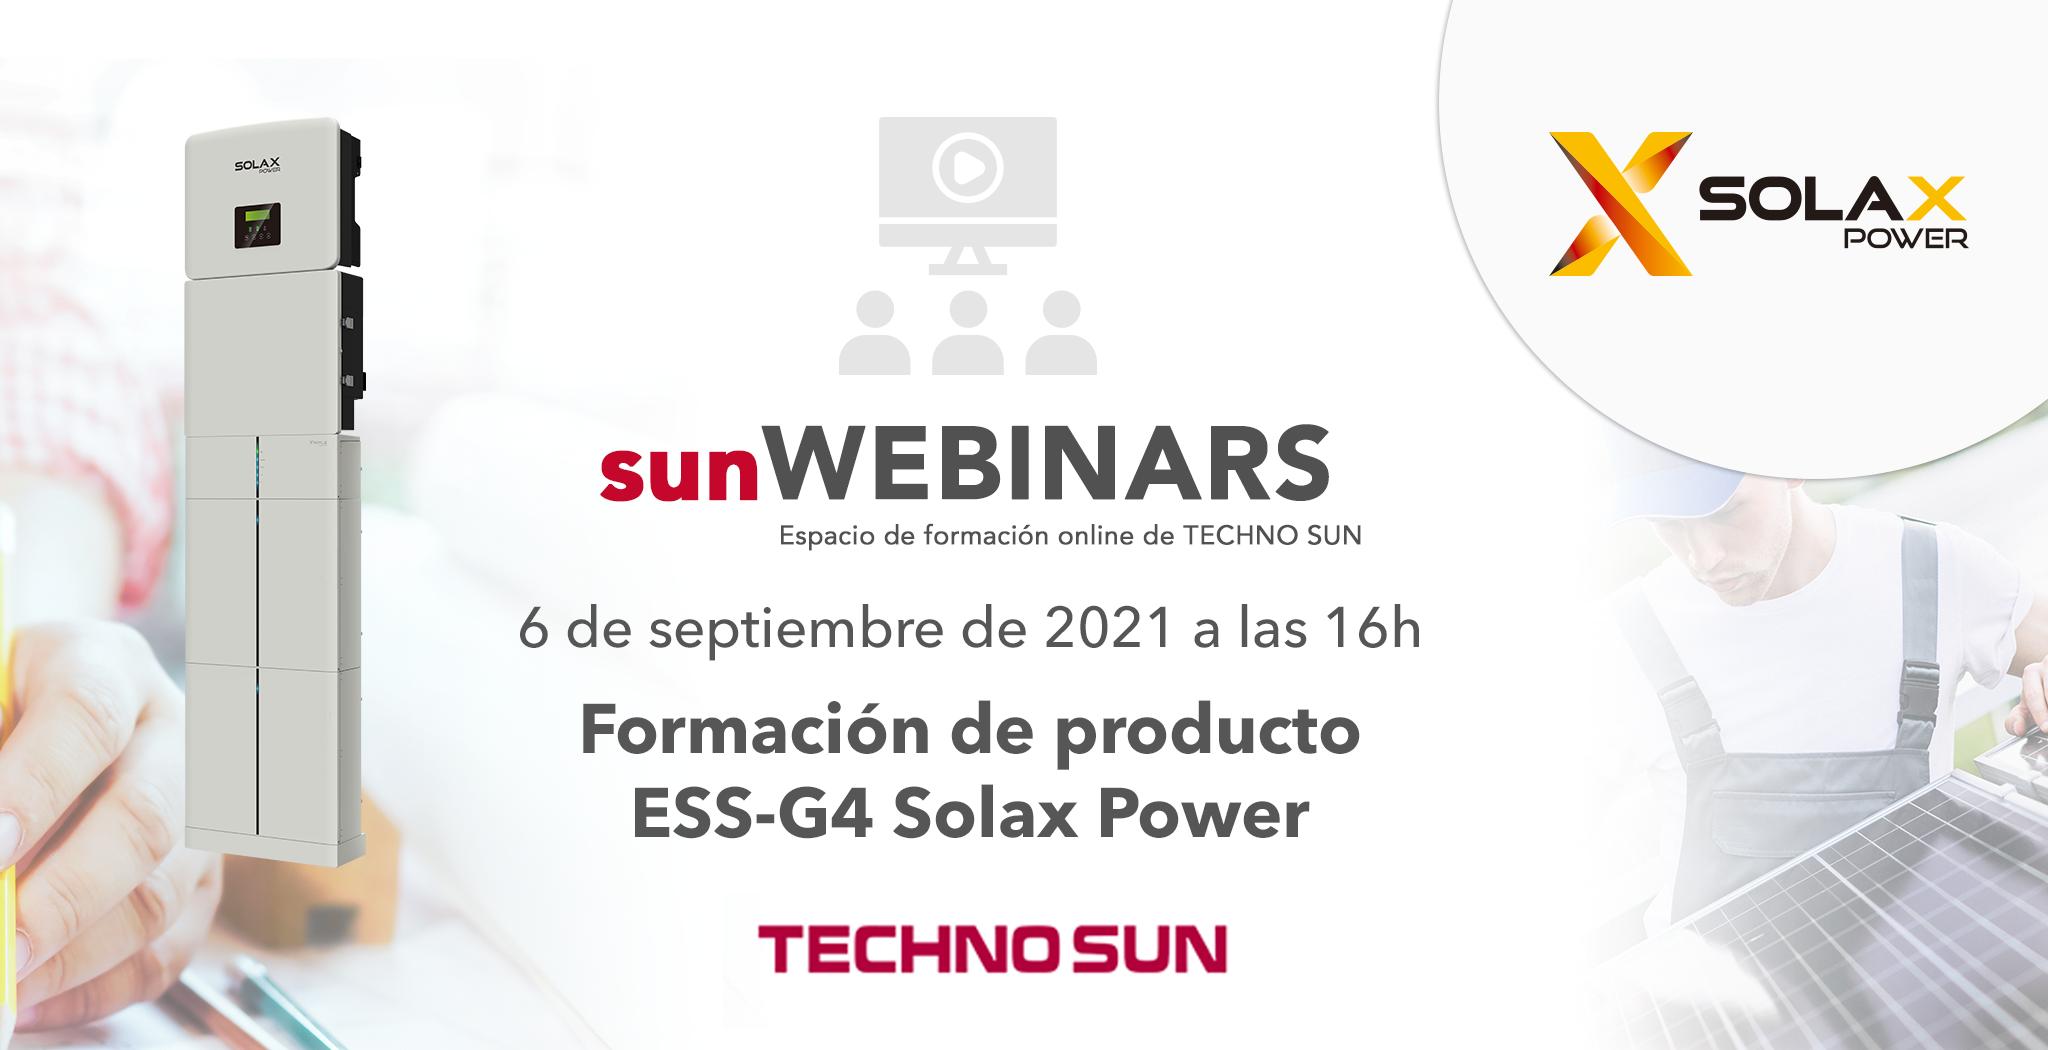 sunWebinar Solax Power ESS-G4